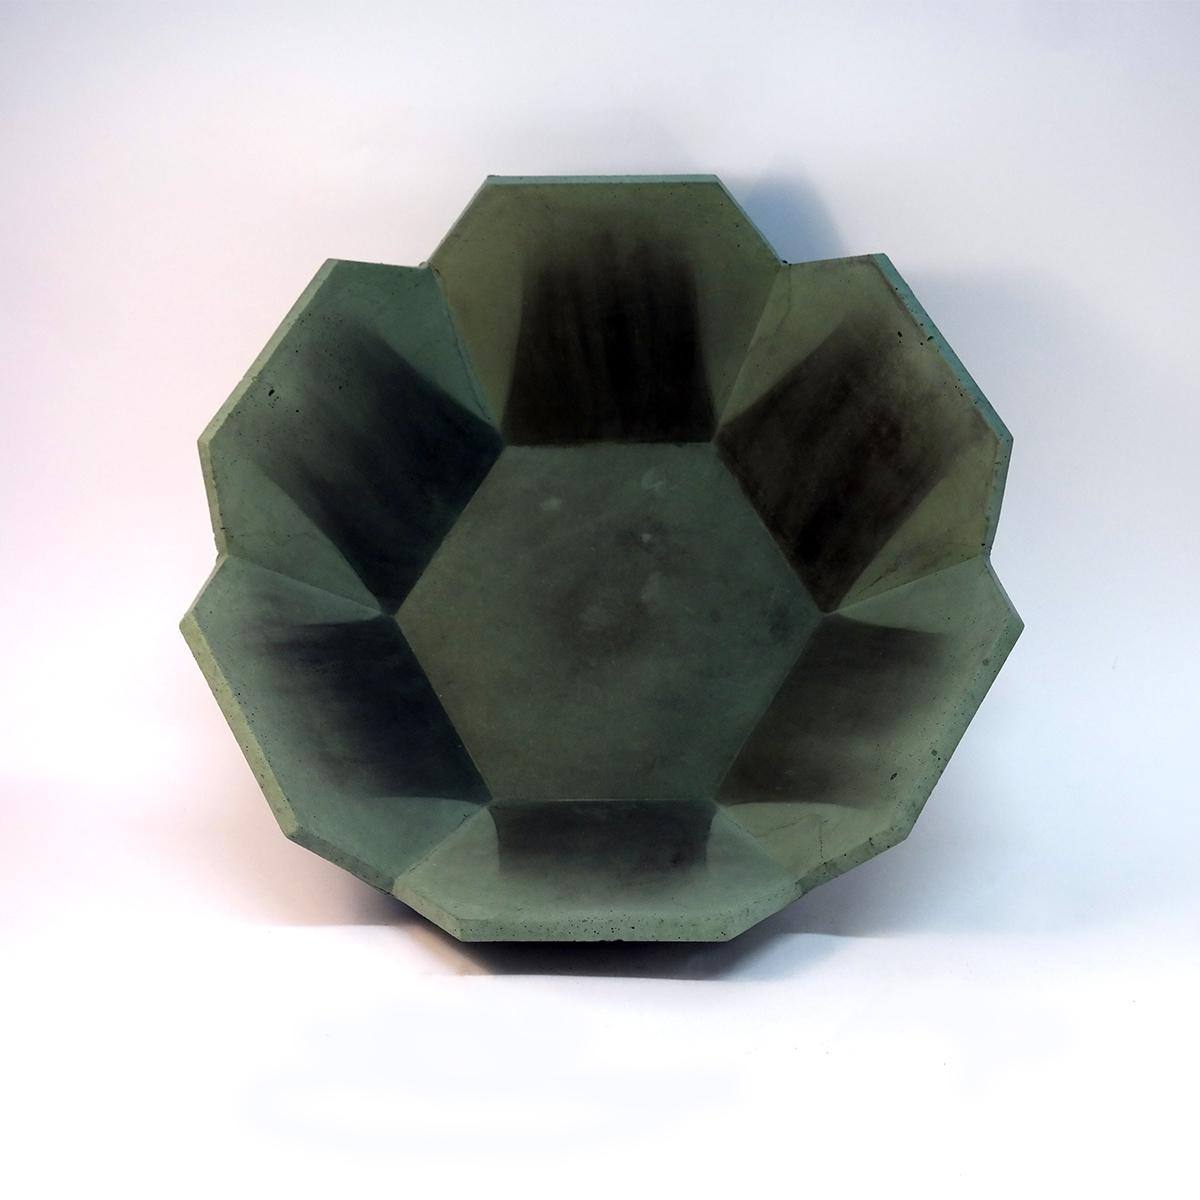 Jack-green-2-vierkant-beton-schaal-groen